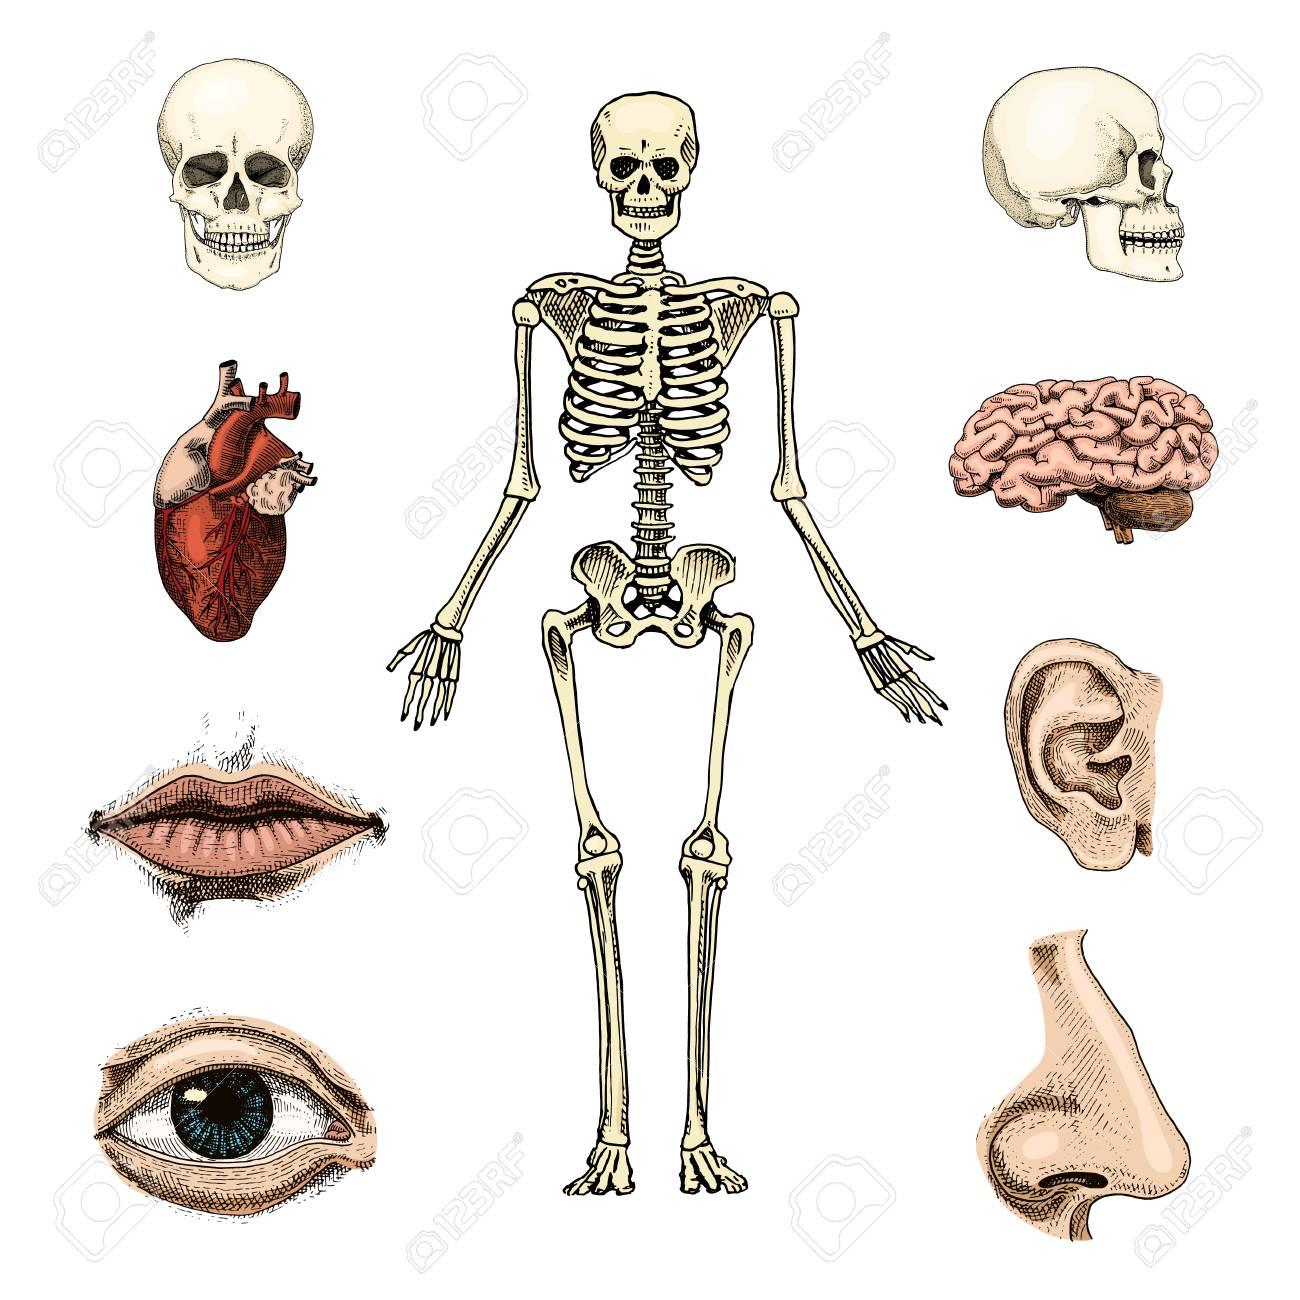 hight resolution of human biology anatomy illustration skull skeleton lips ear nose